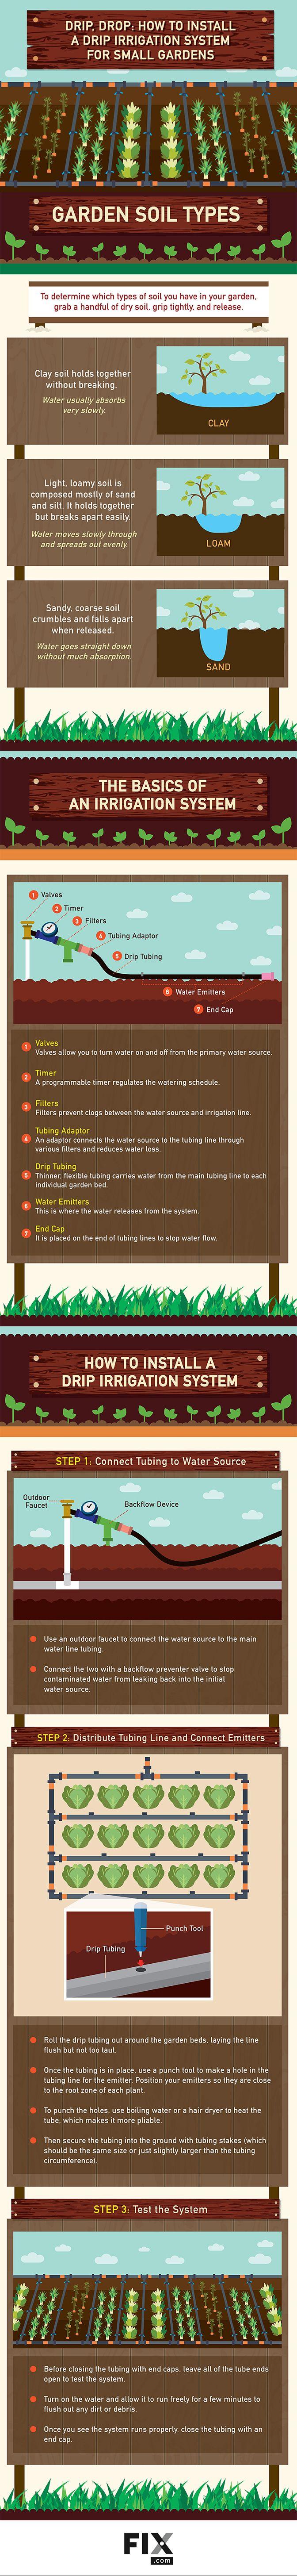 10 best irrigation watering images on pinterest vegetable garden